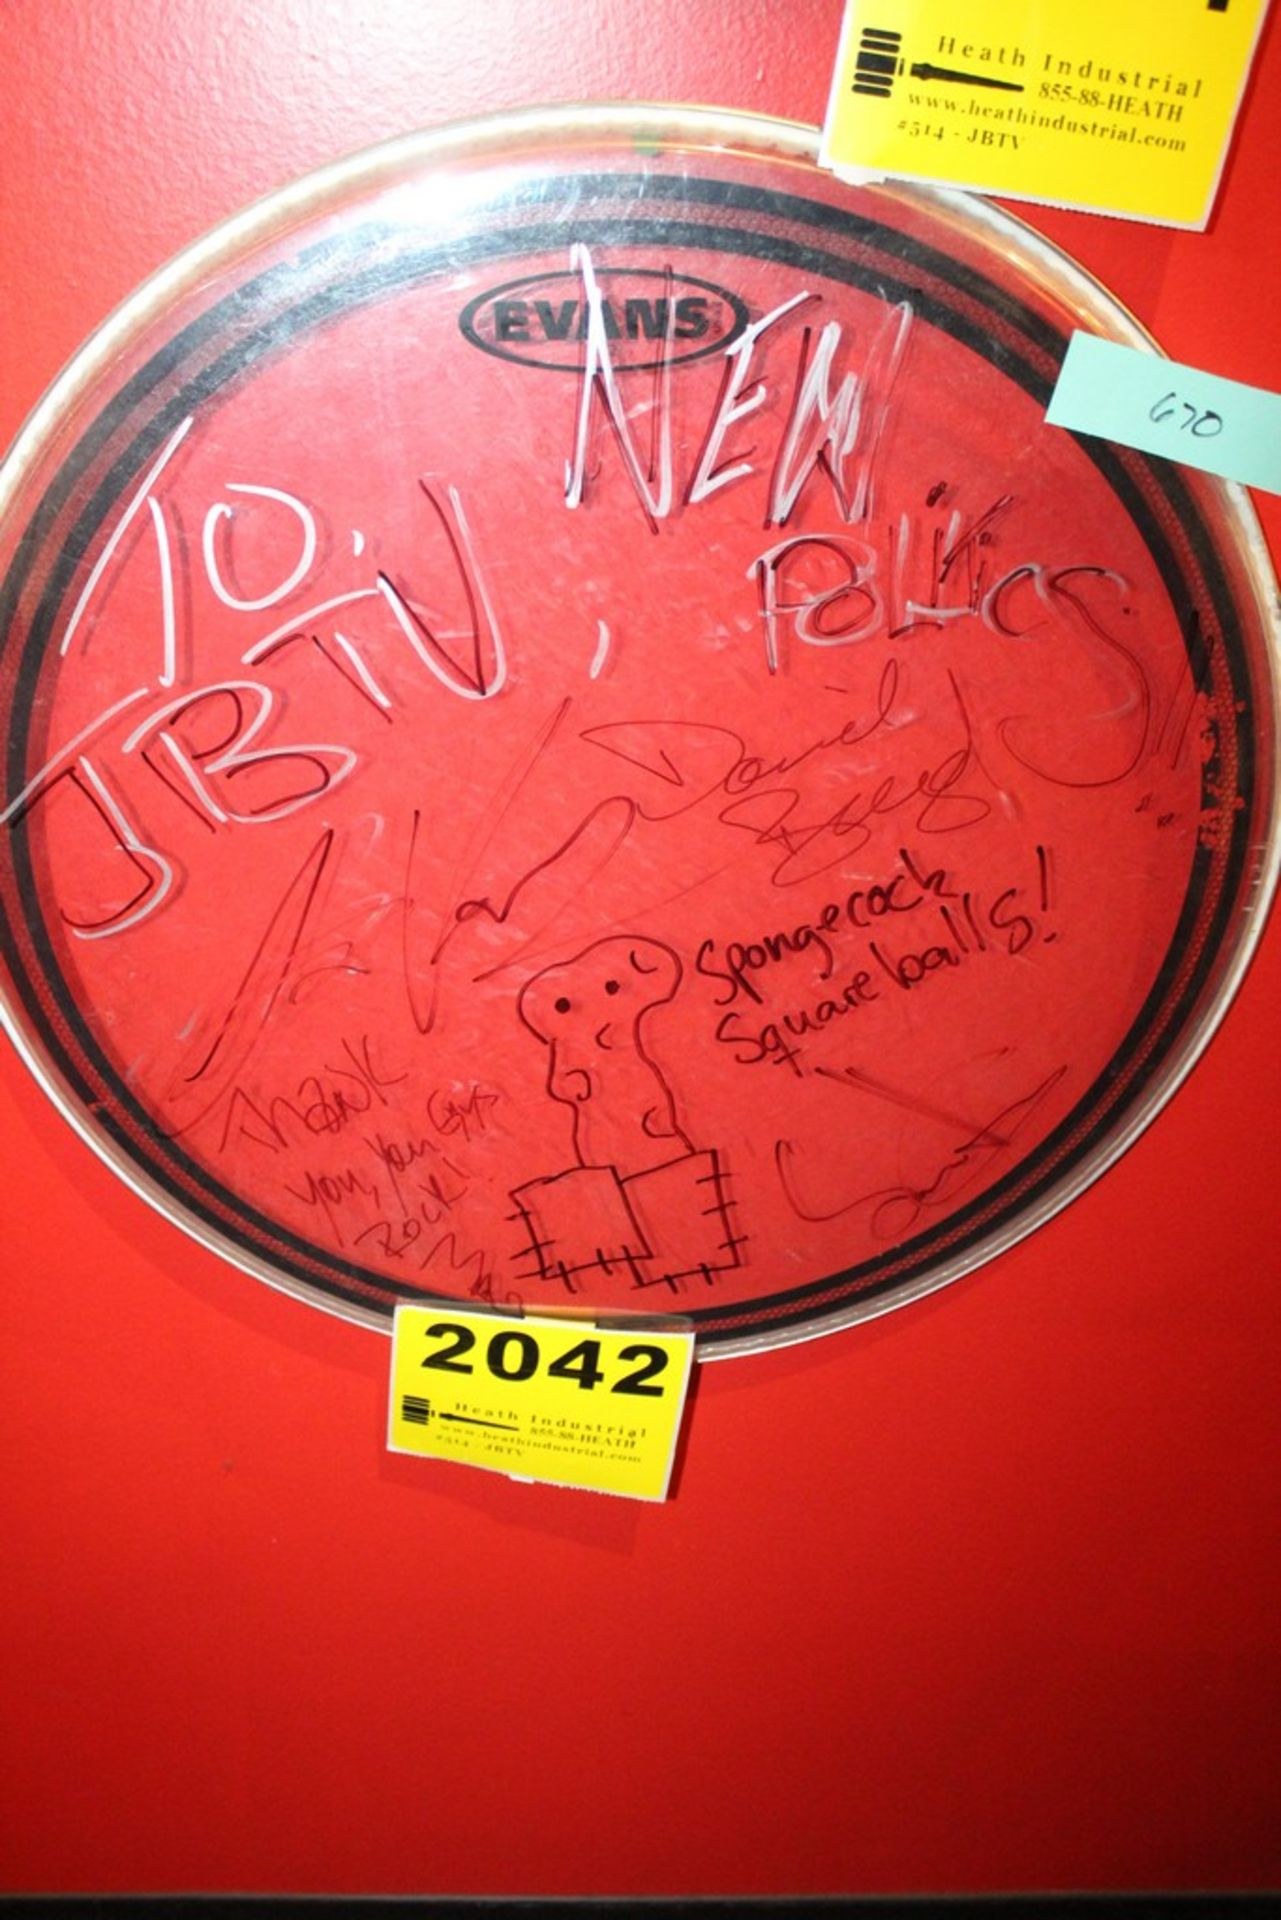 Lot 2042 - New Politics Signed Drum Head